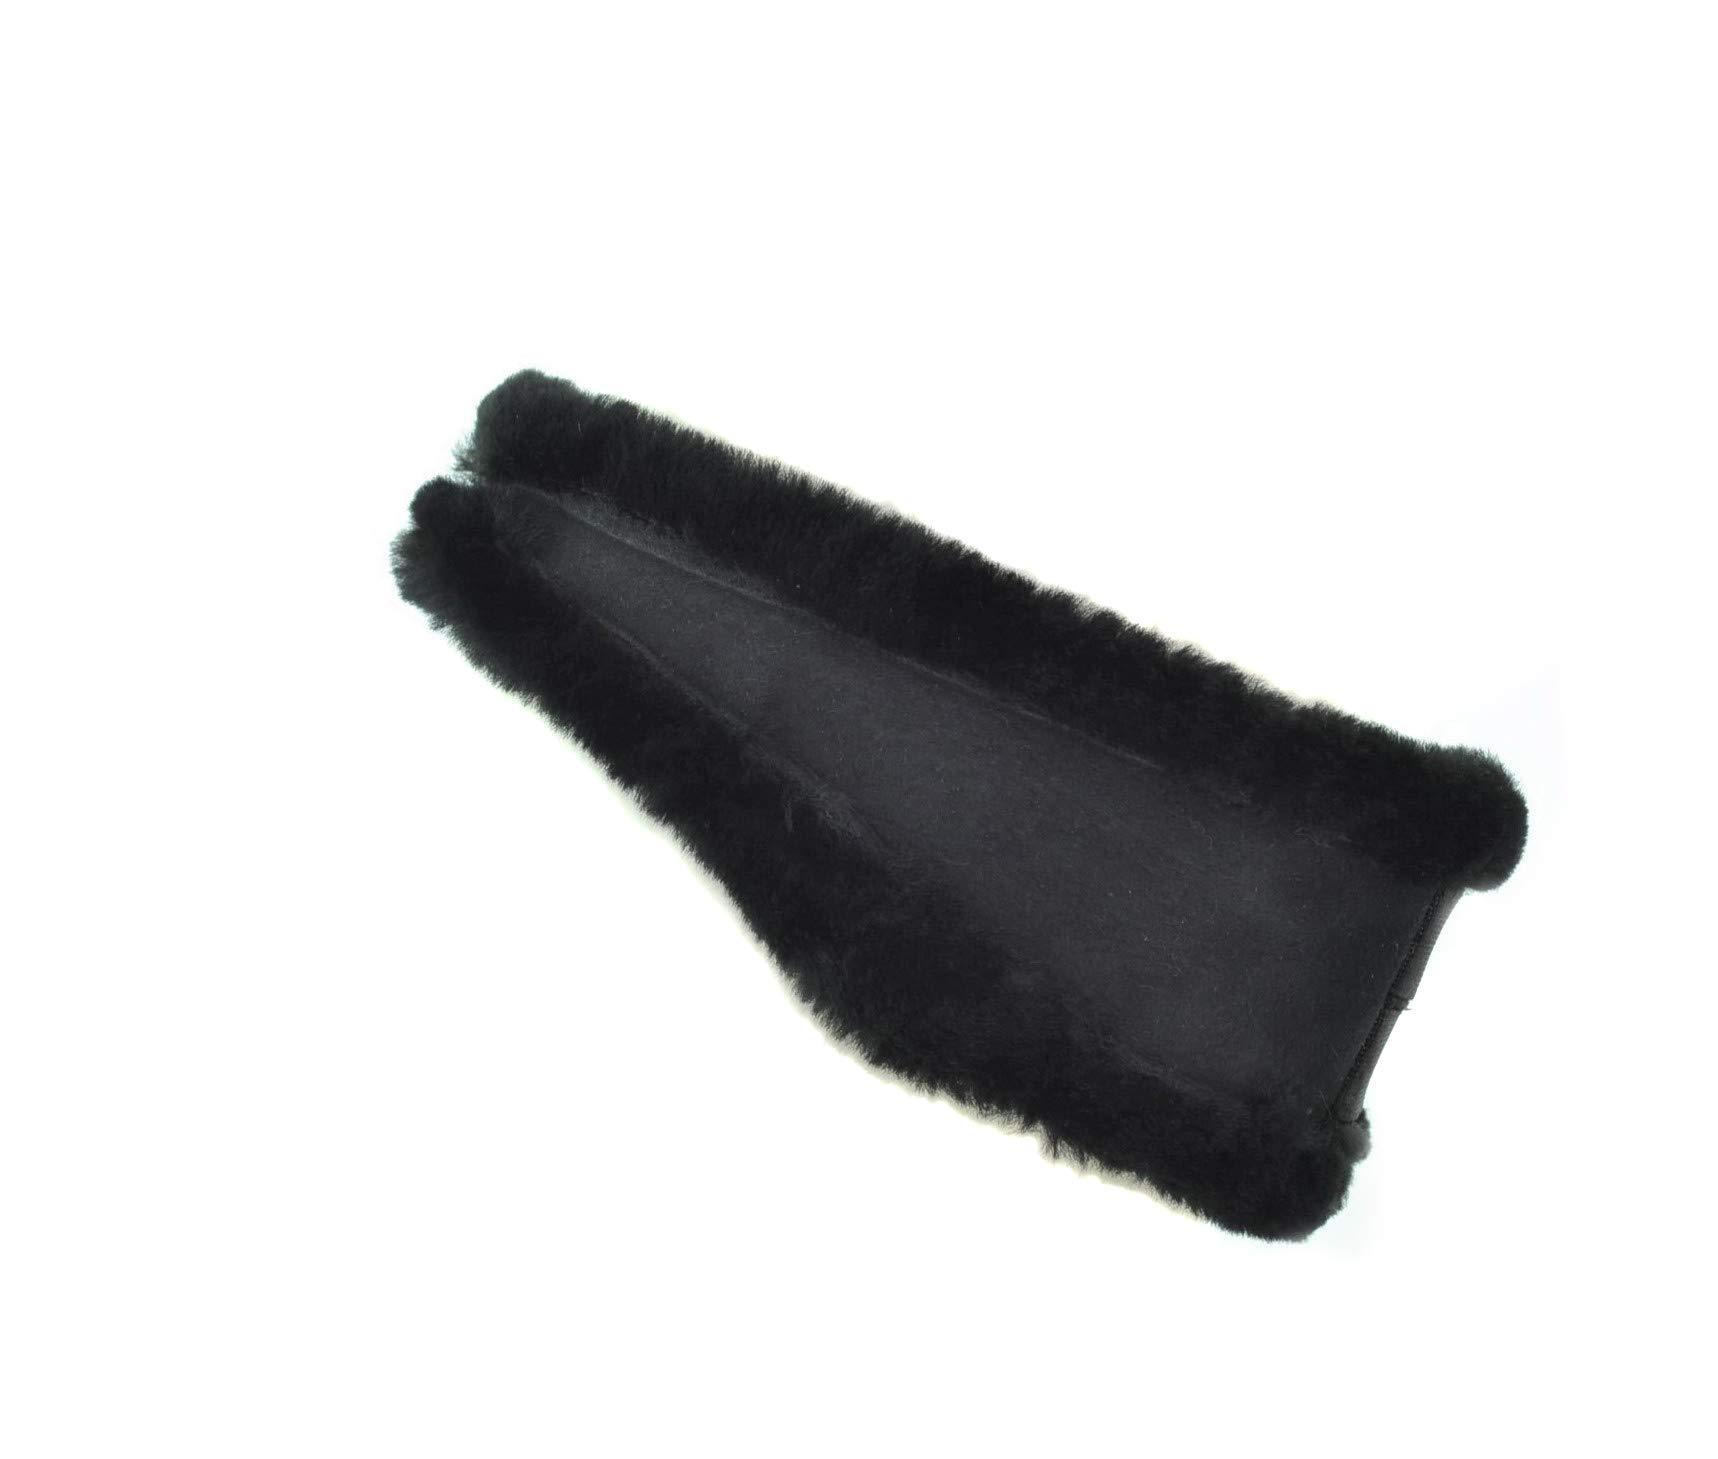 Surell Genuine Soft Black Shearling Headband - Winter Fashion Sheepskin Ear Warmers - Perfect Elegant Women's Luxury Gift by surell